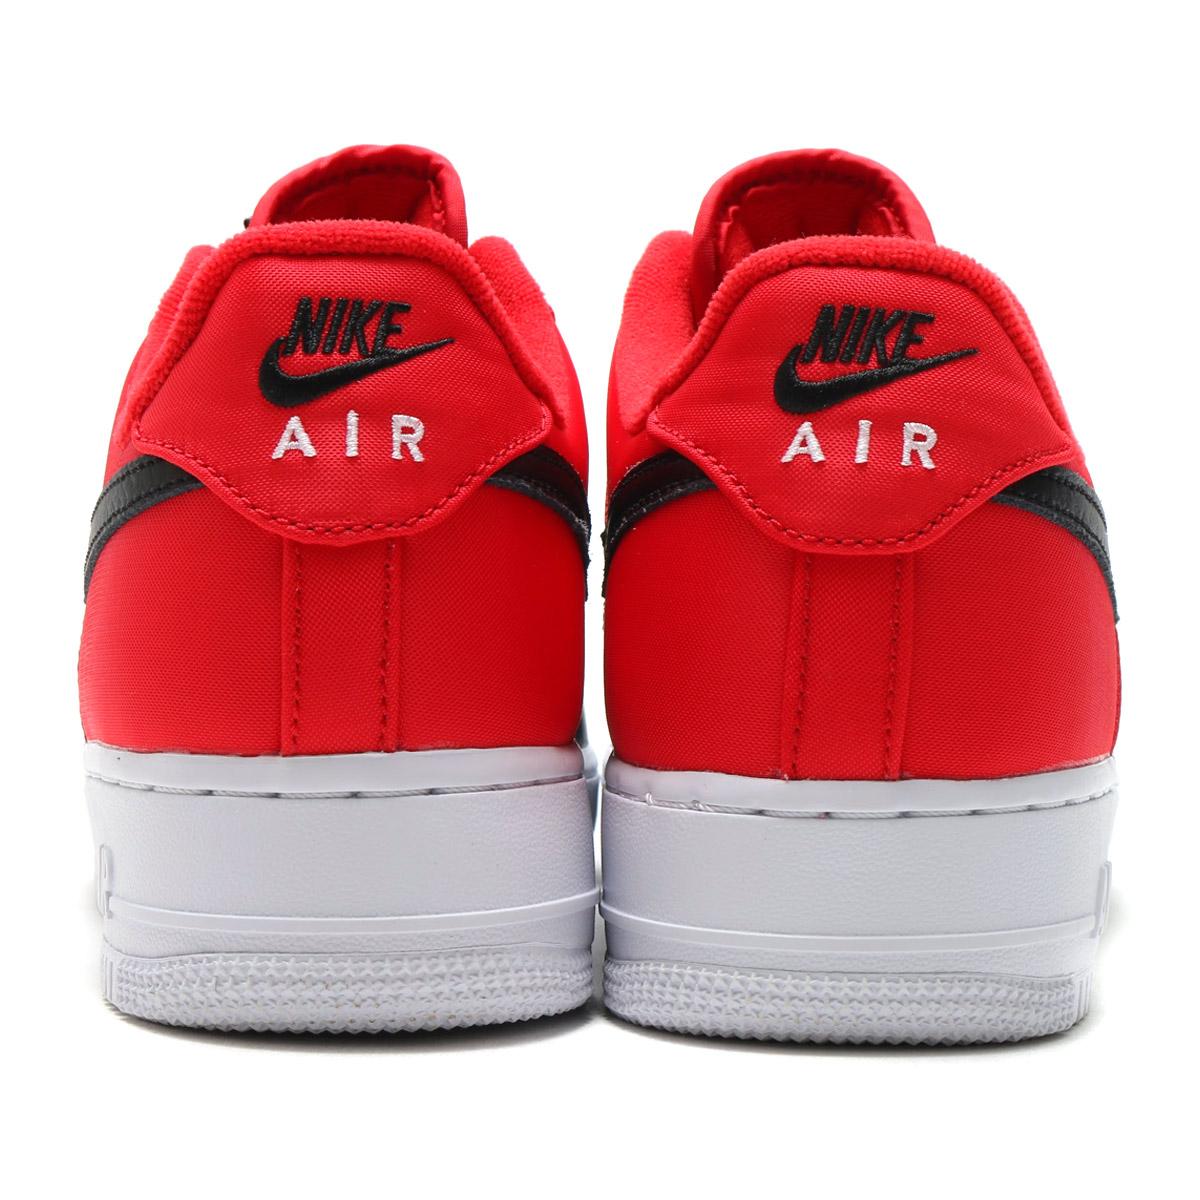 NIKE AIR FORCE 1 '07 LV8 (나이키 에어포스 1 07 LV8) (UNIVERSITY RED/BLACK-WHITE-PURE PLATINUM) 17 FA-I